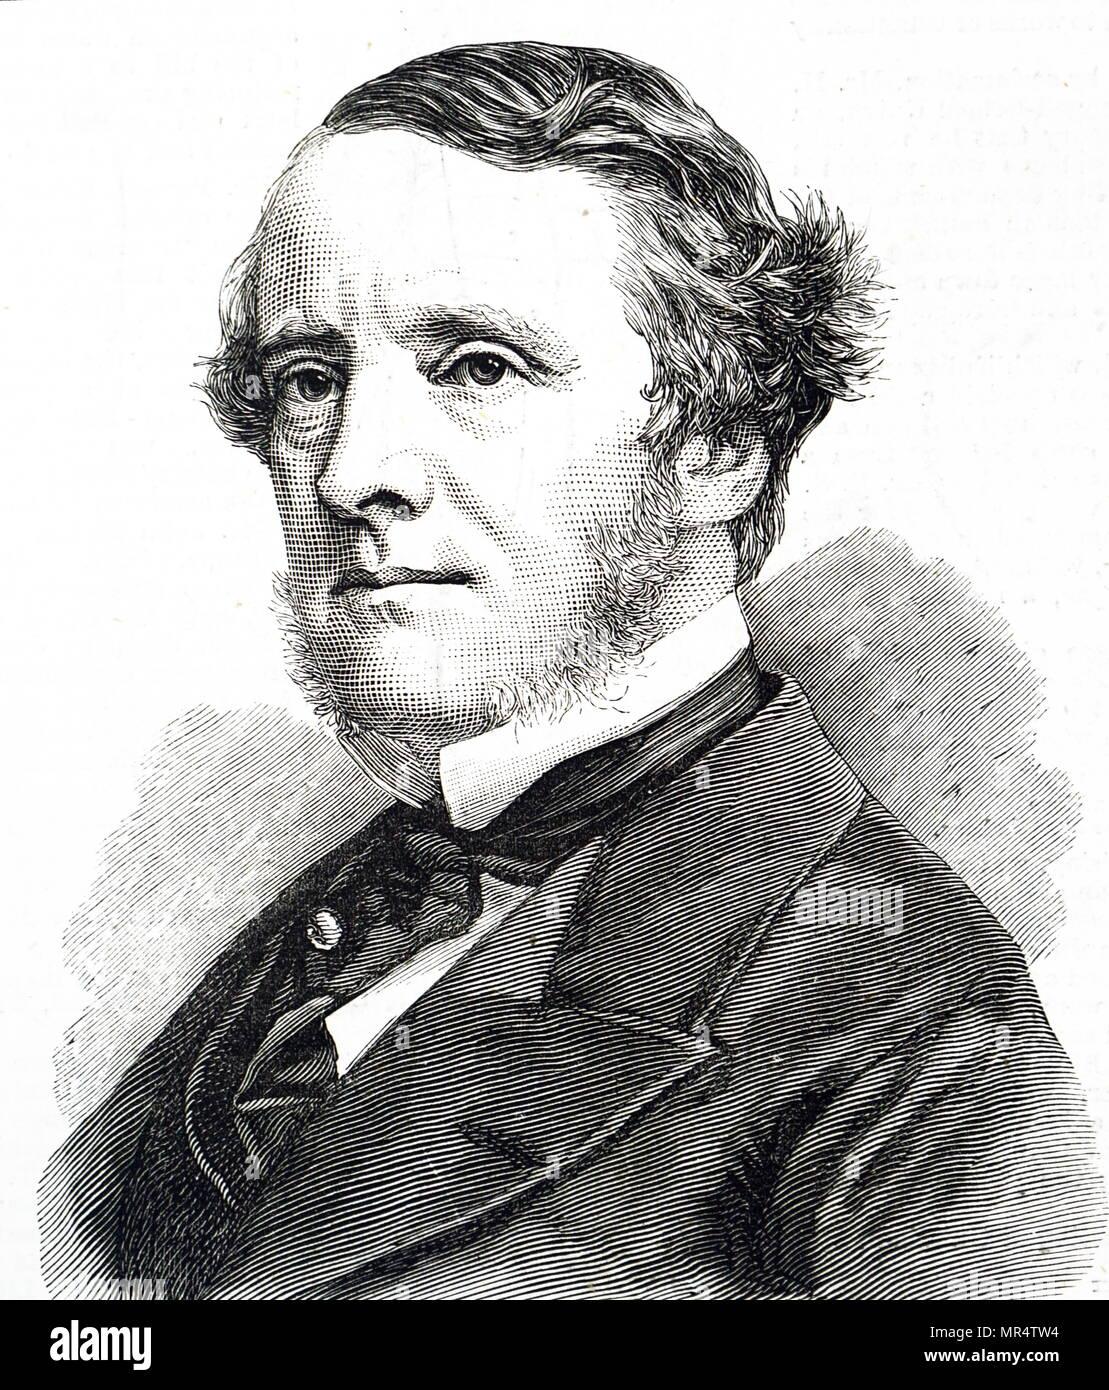 Portrait of Chichester Parkinson-Fortescue, 1st Baron Carlingford (1823-1898) a British Liberal politician. Dated 19th century Stock Photo